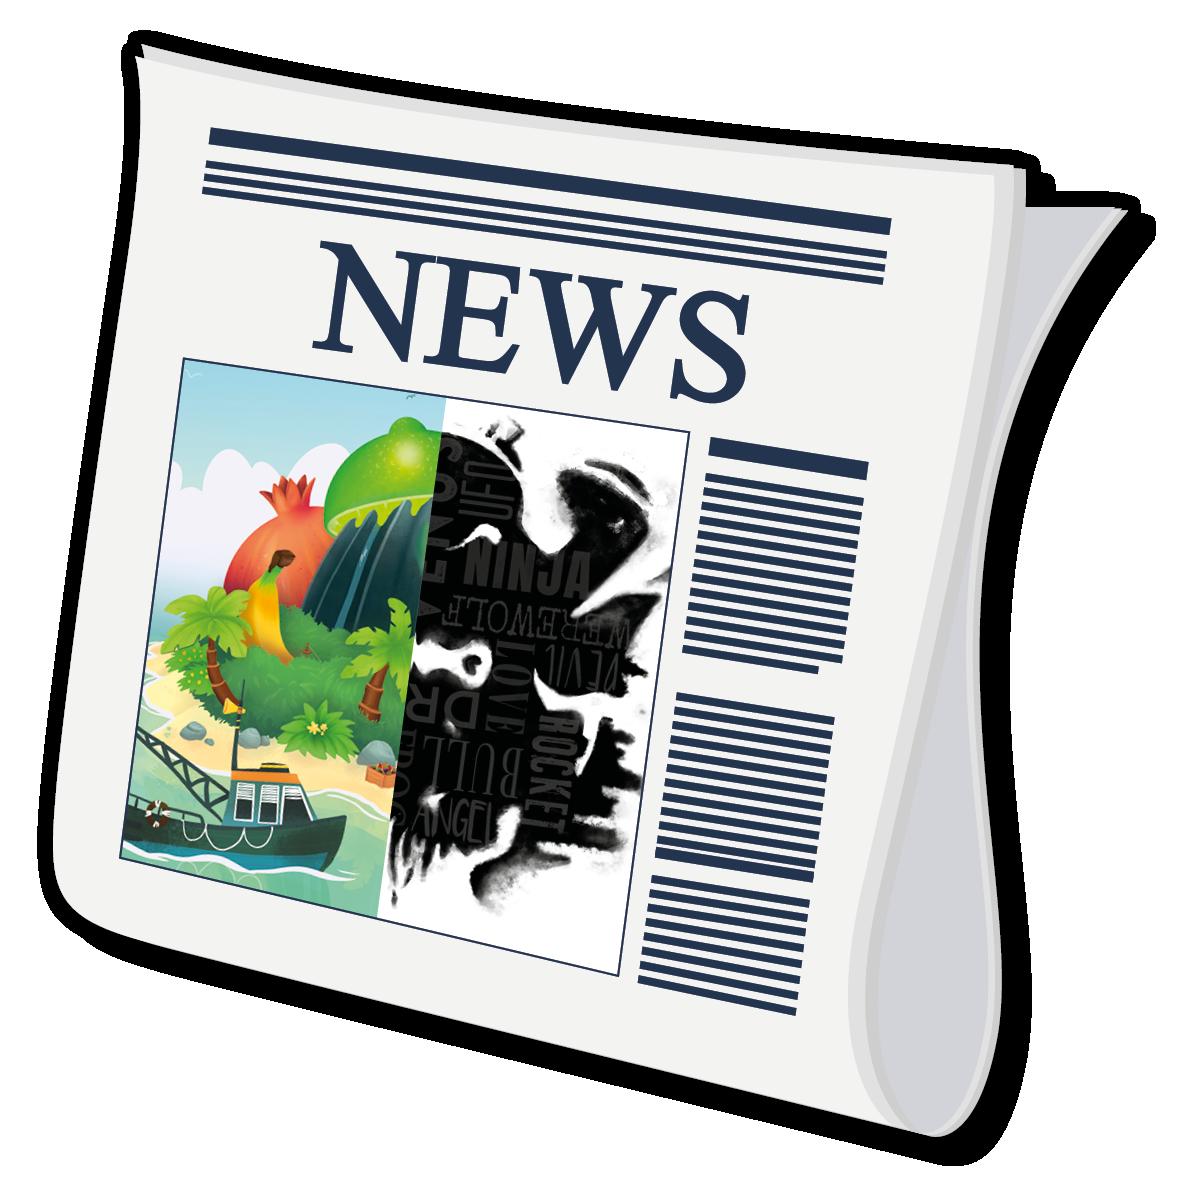 News Juicy Fruits Rorschach